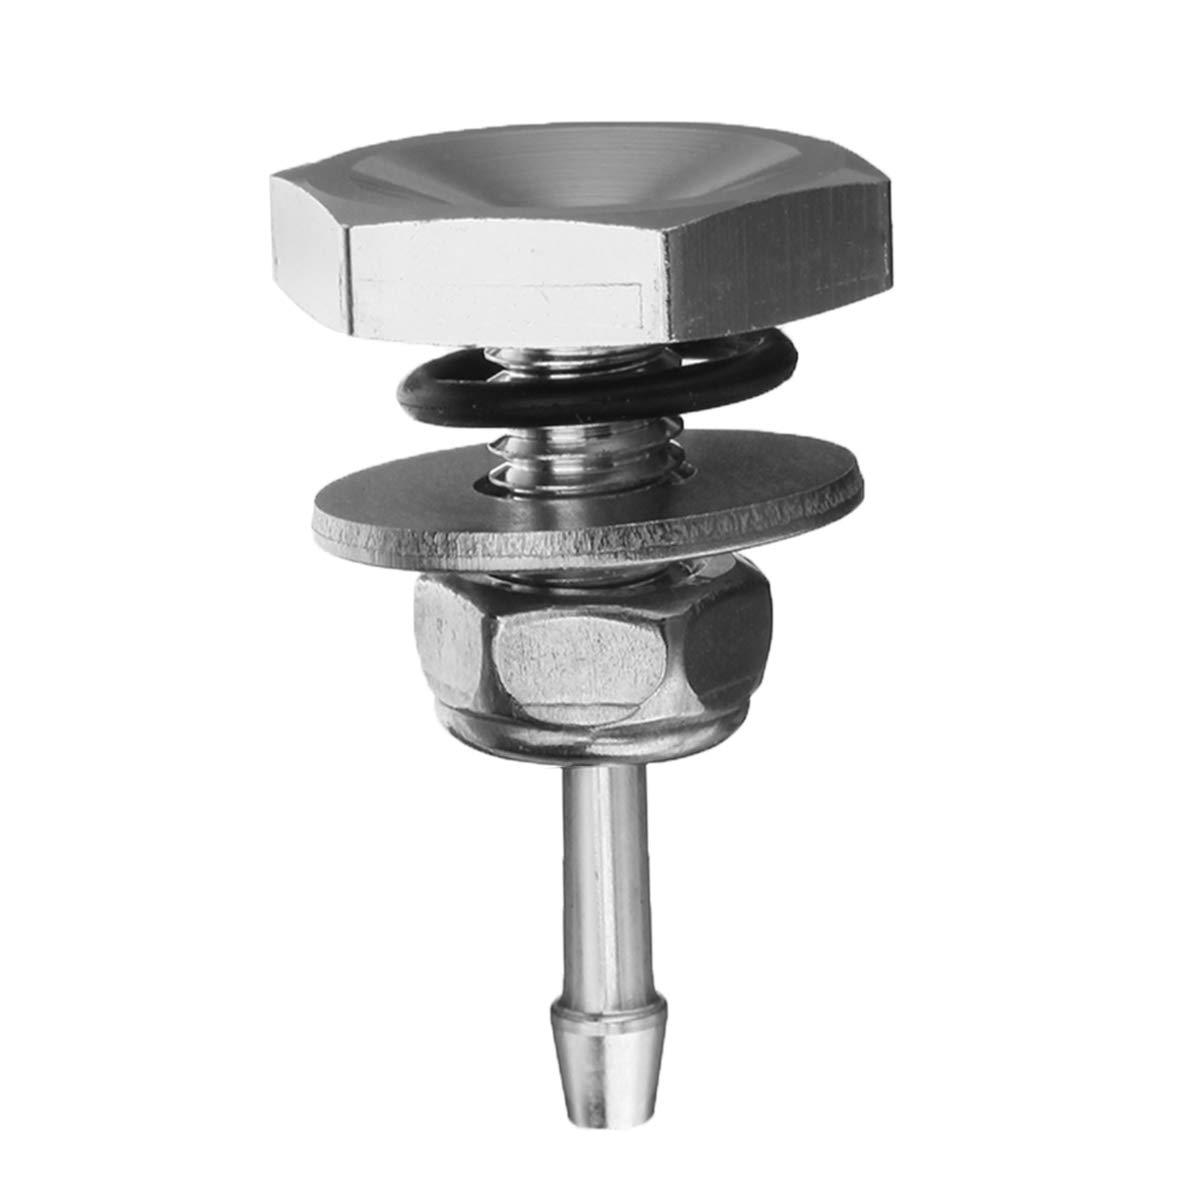 FeLiCia Voiture Universal Turbocompresseur Silicone Boost Pipe Mamelon Turbo Manomè tre Ajustement